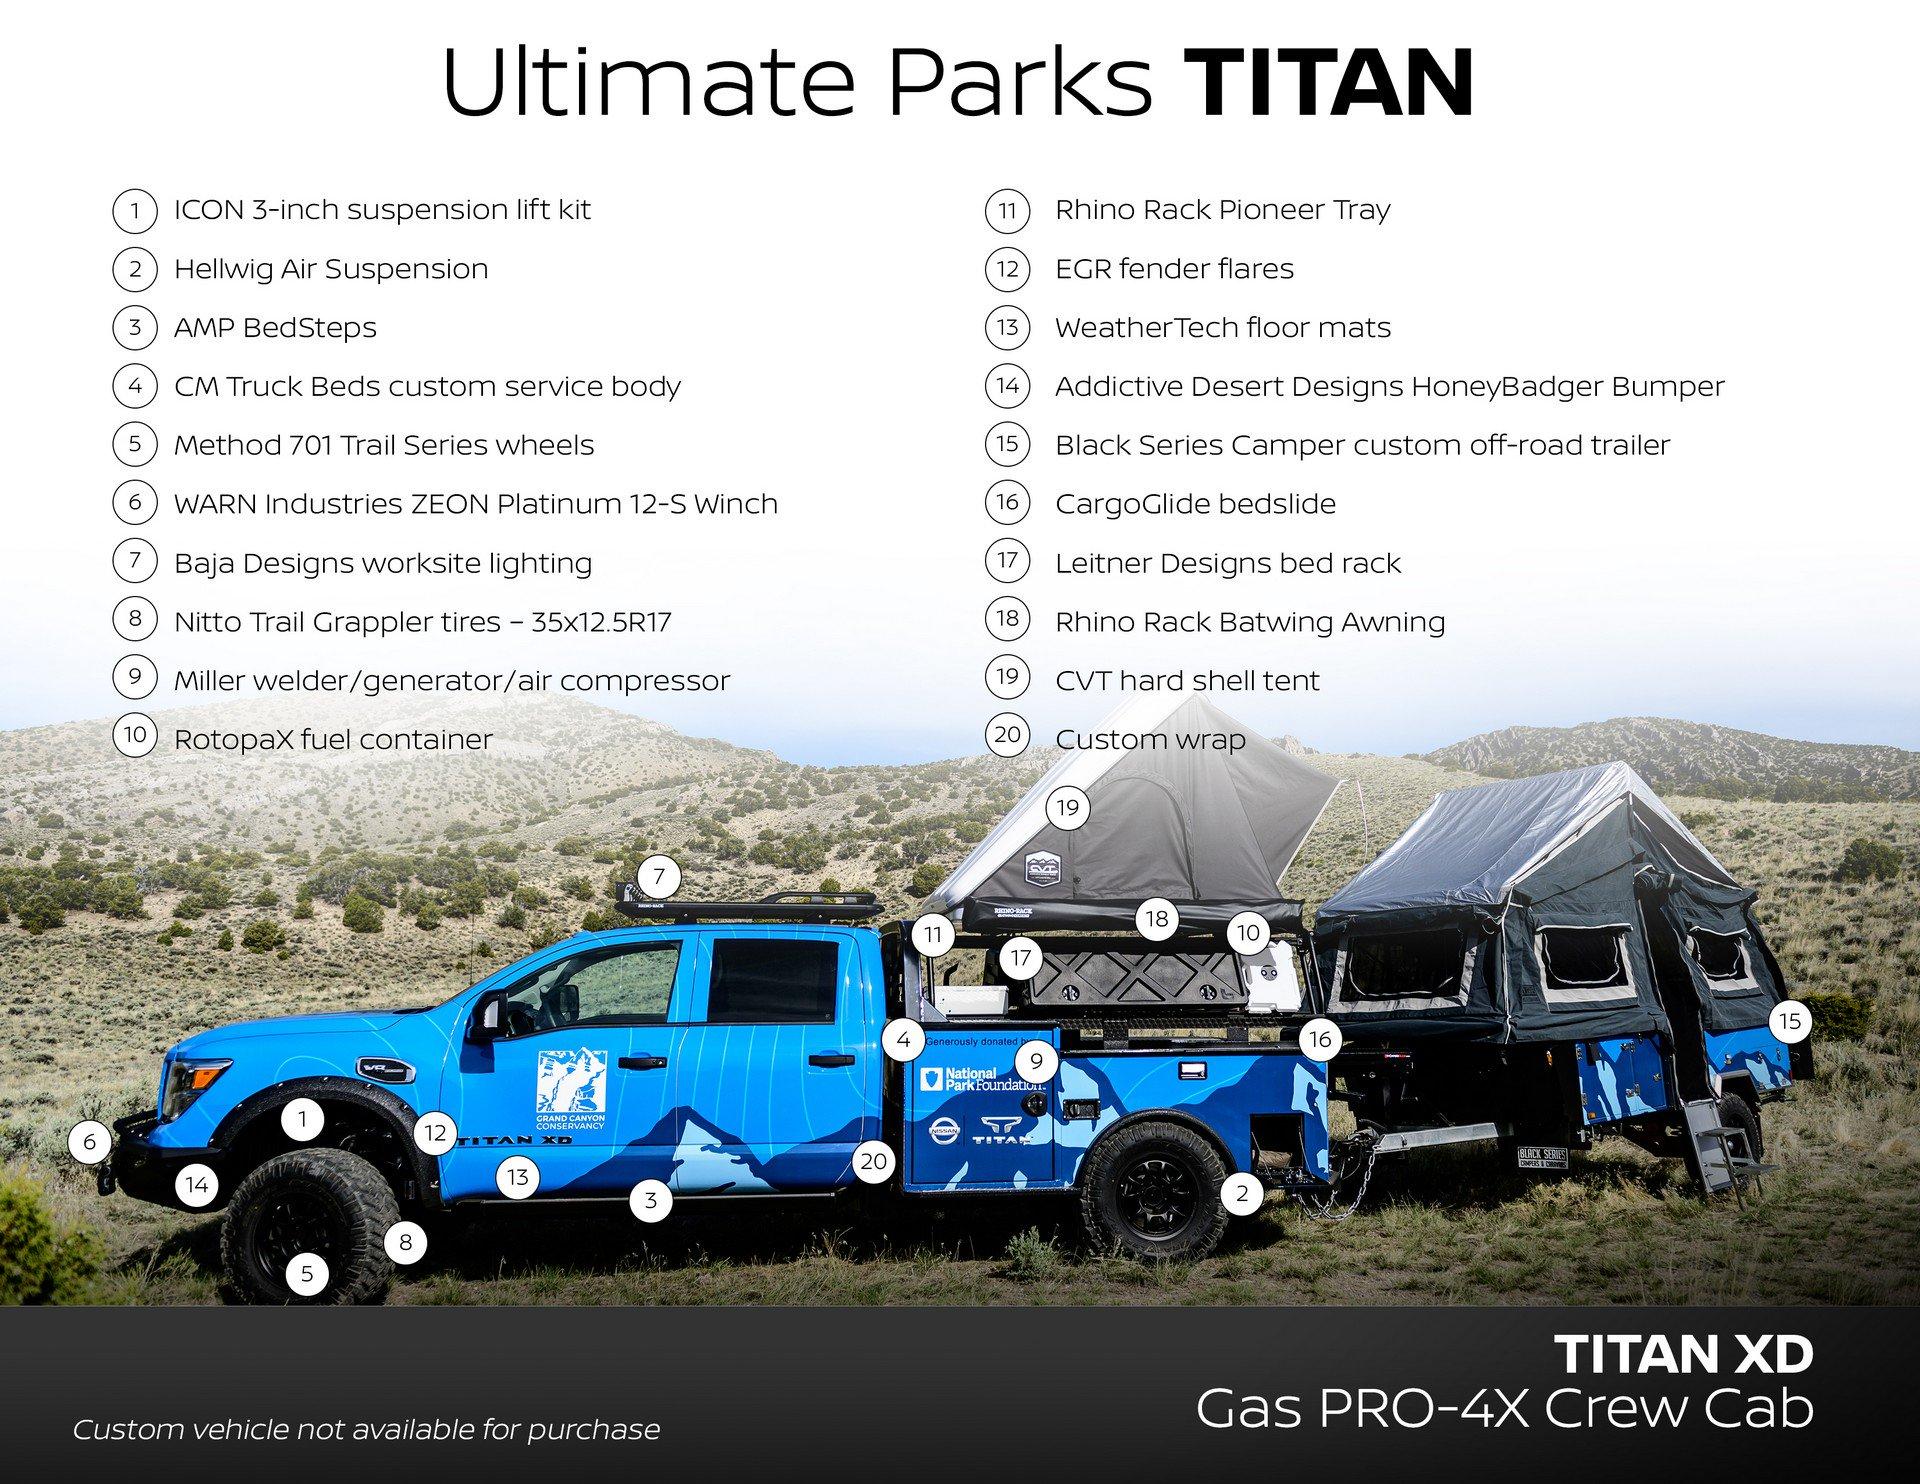 Nissan-Ultimate-Parks-Titan-XD-29